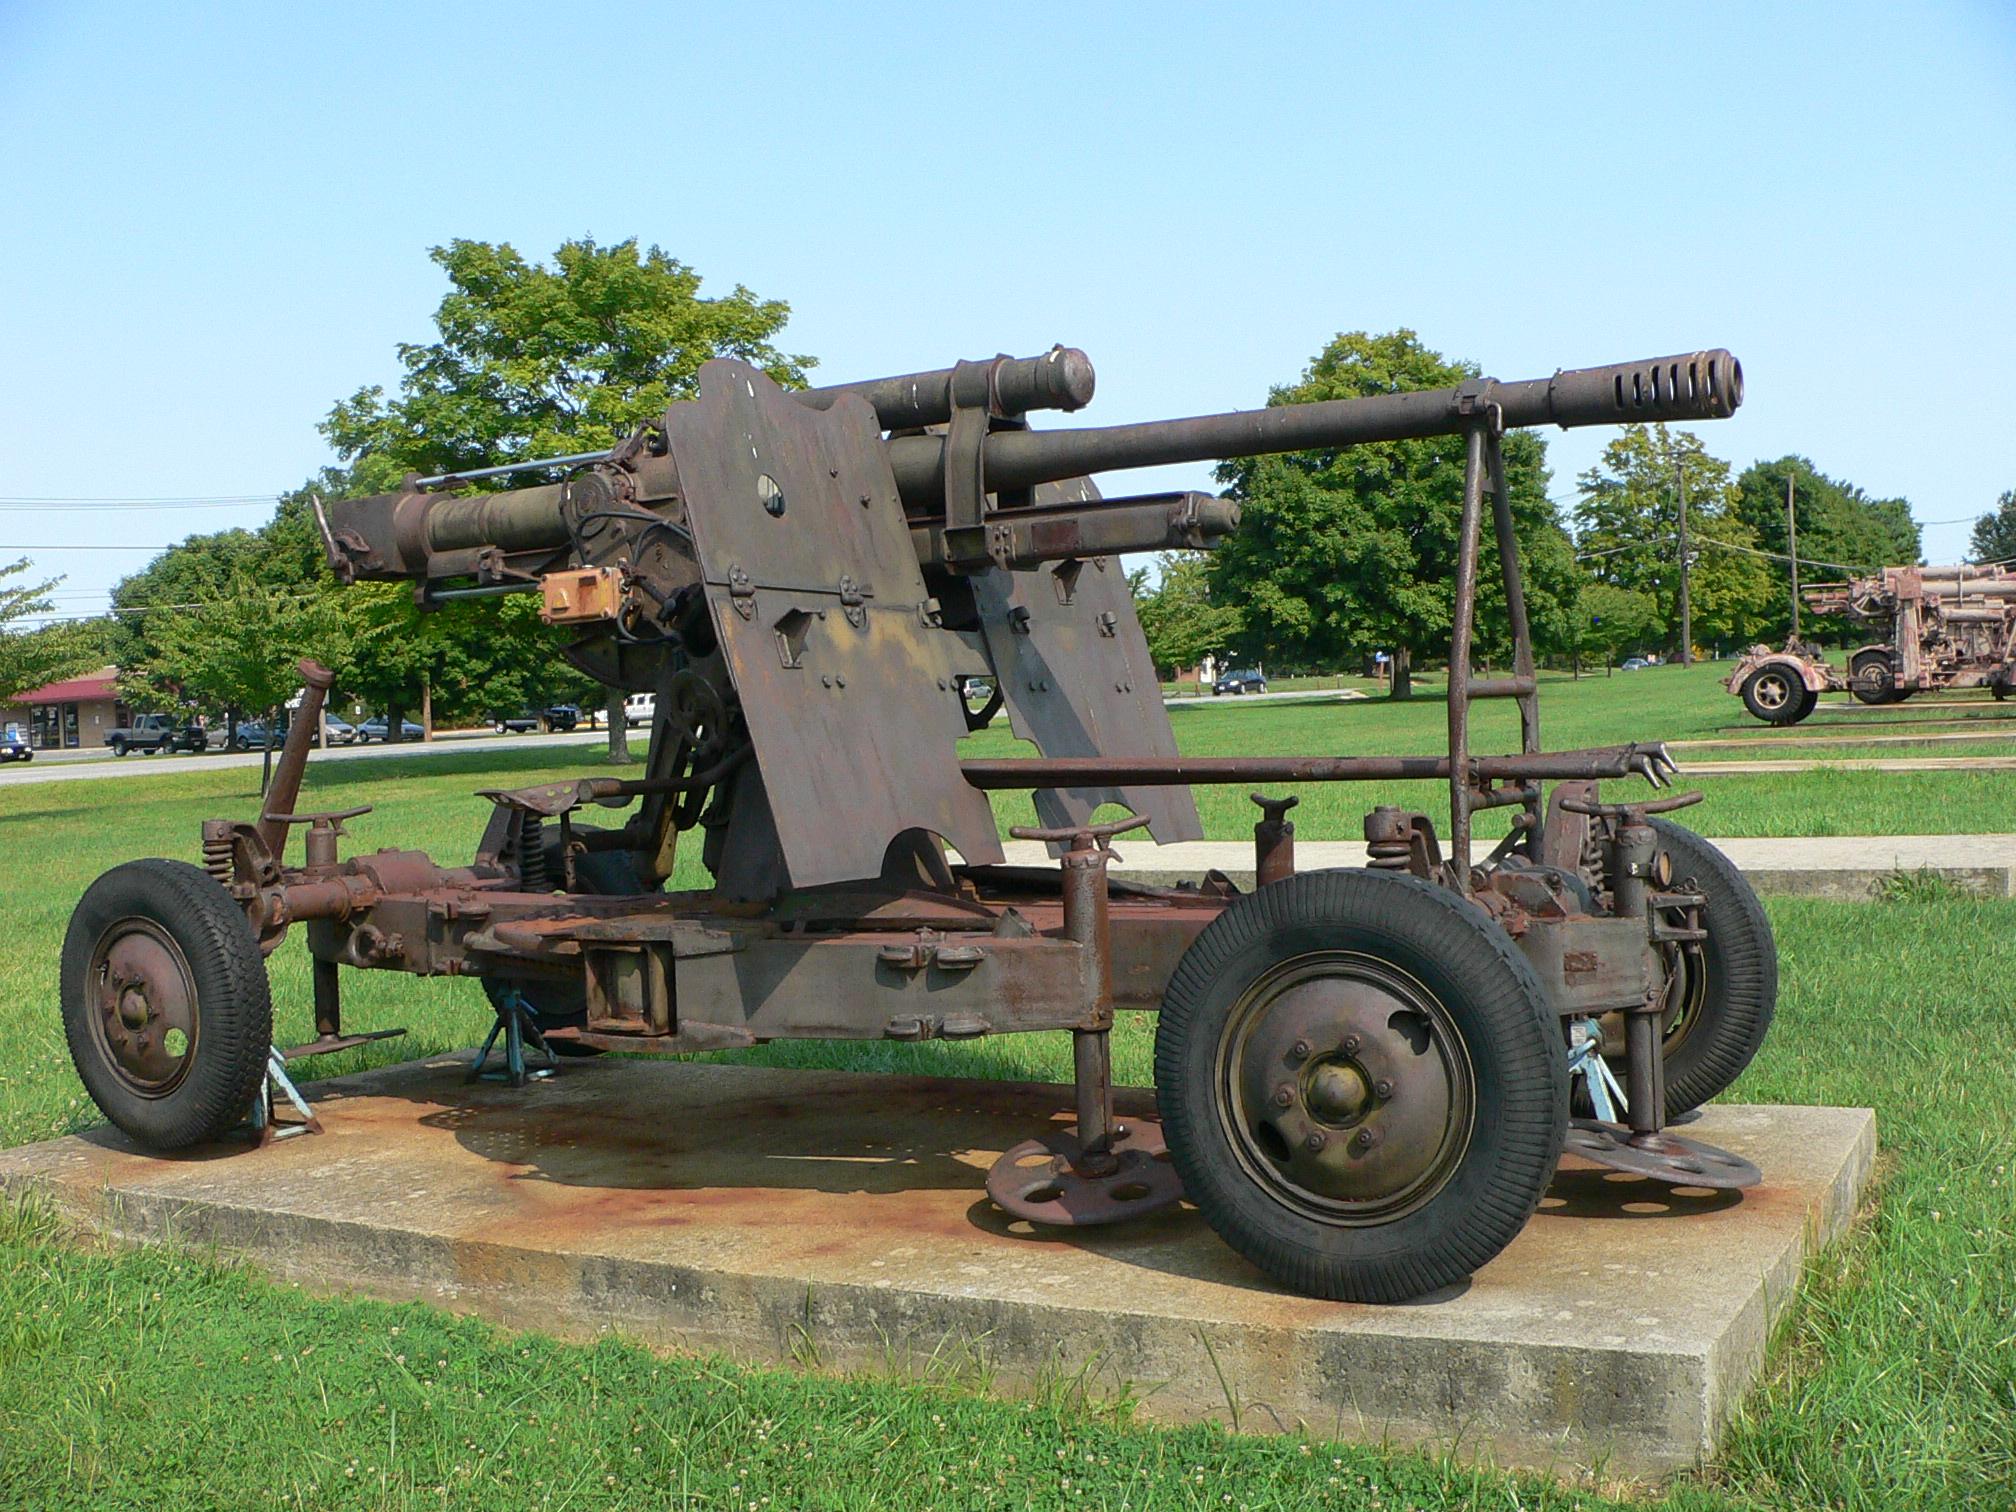 File:85 mm air defense gun M1939 (52-K) 11.jpg - Wikimedia ...